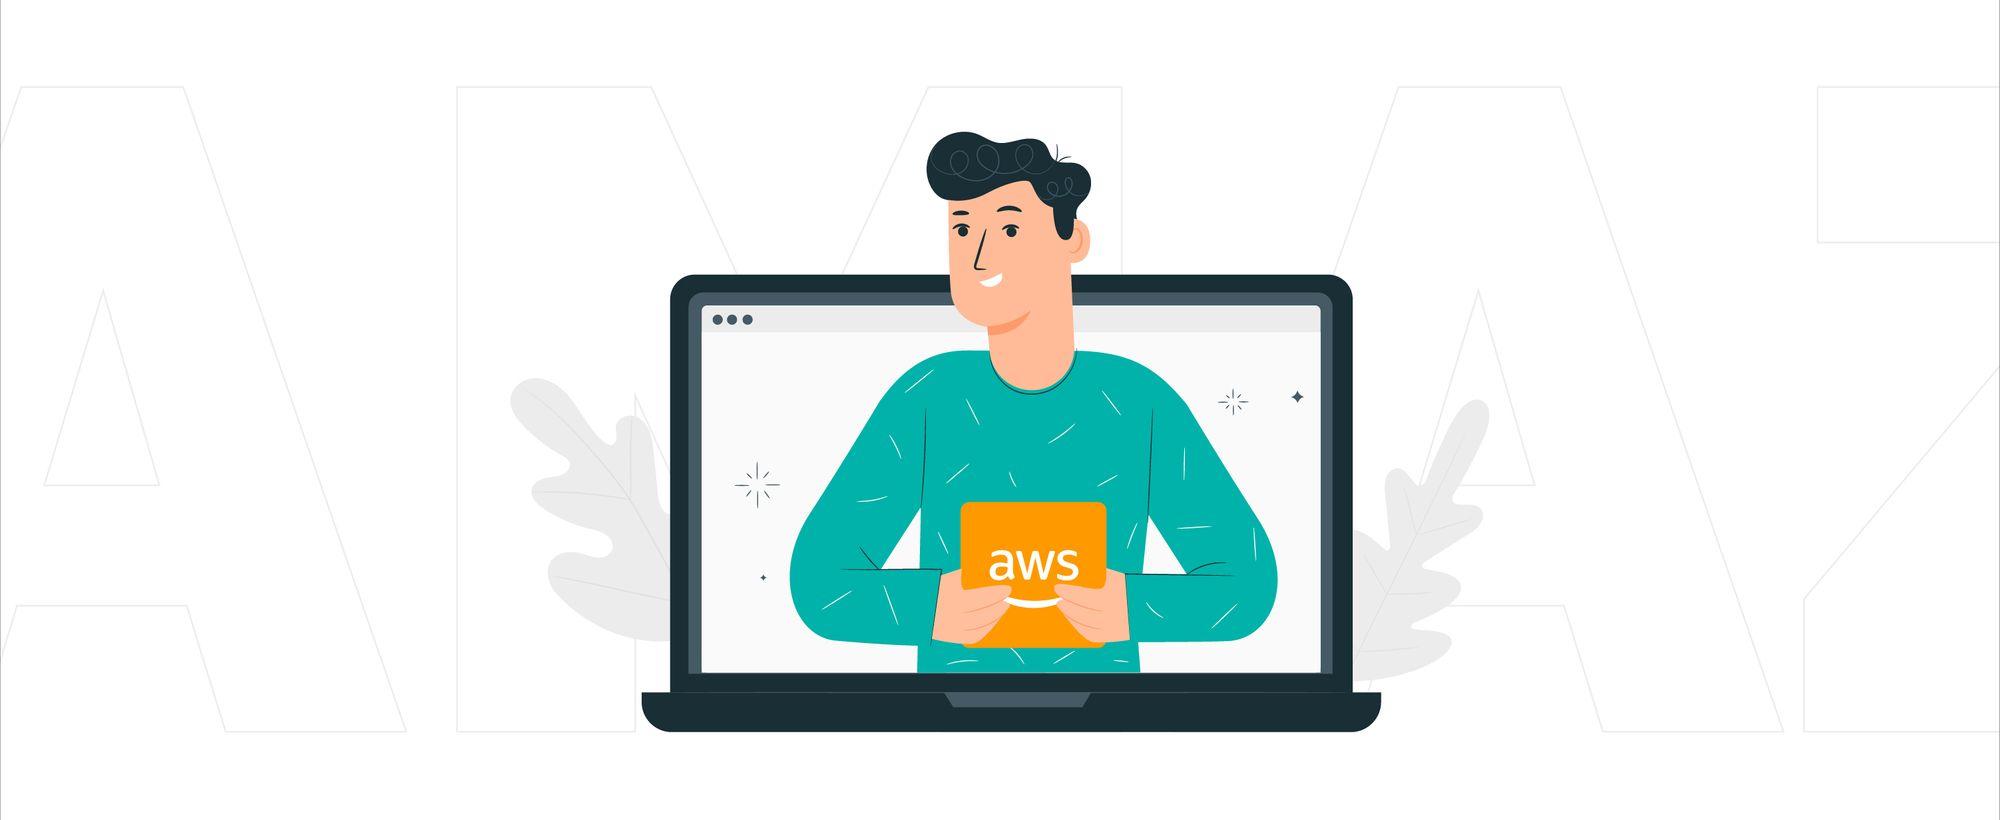 Providing AWS Cloud Security 2021   TechMagic.co